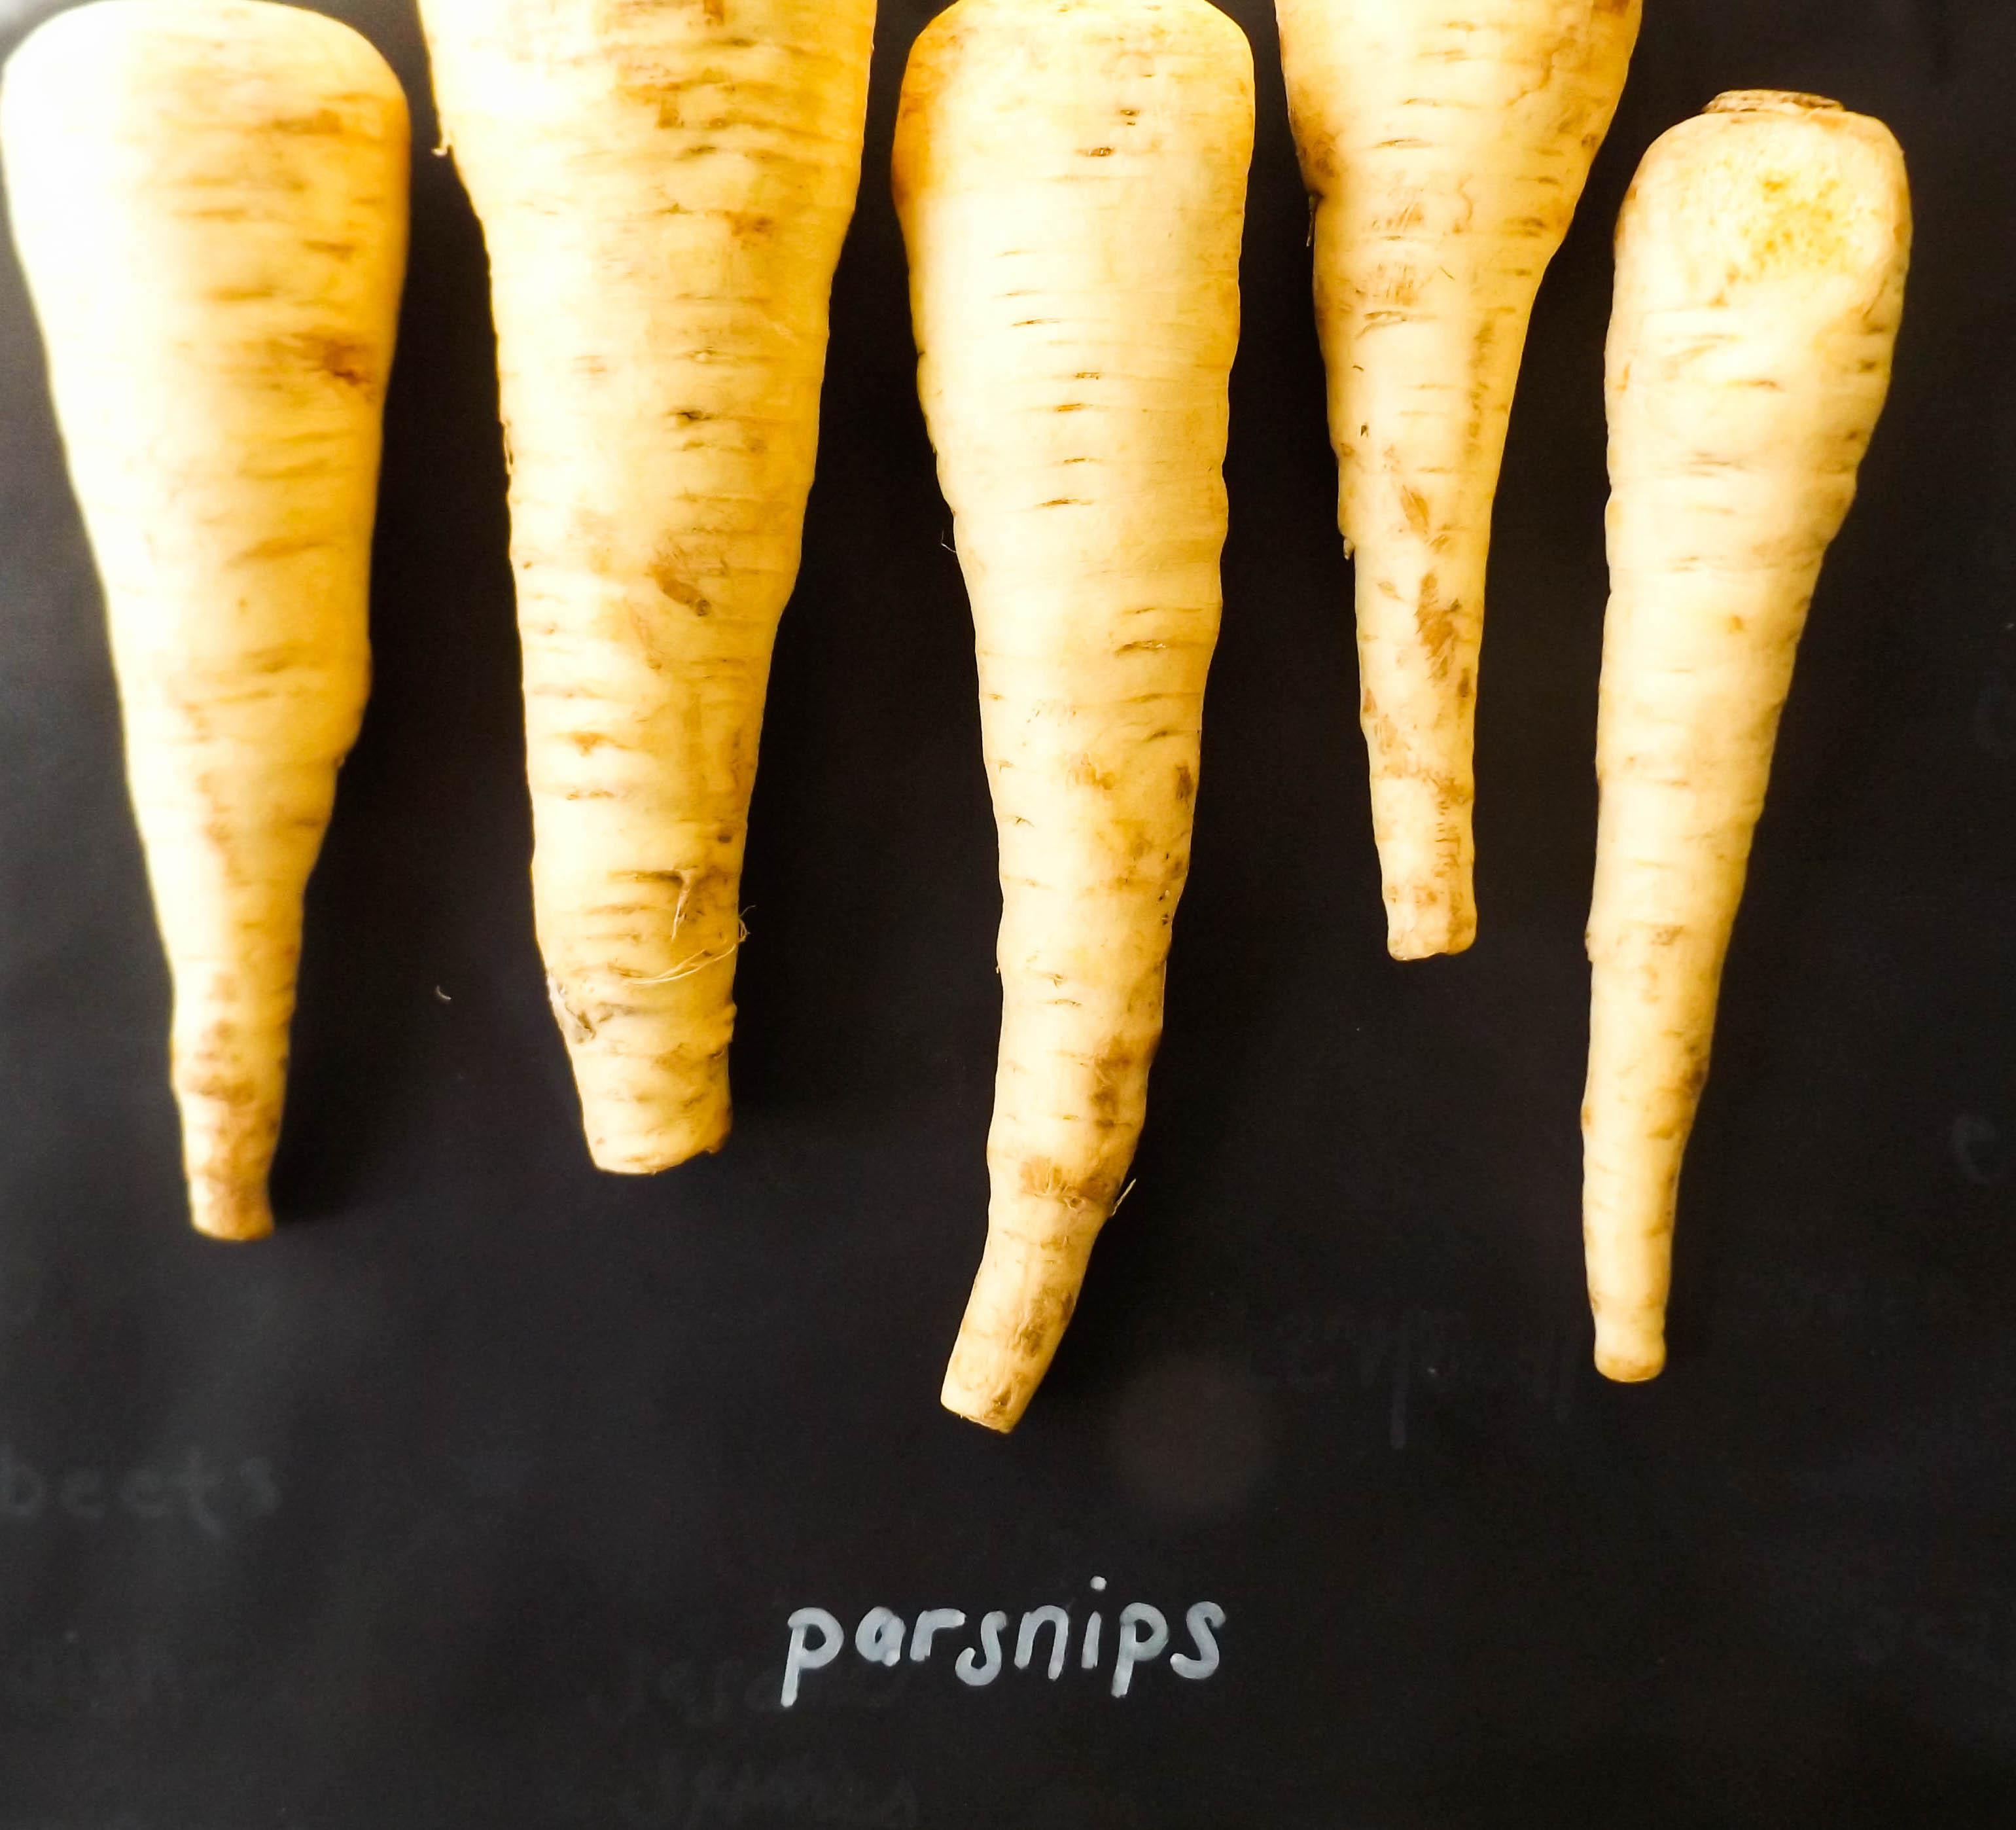 Featured Ingredient: Parsnips